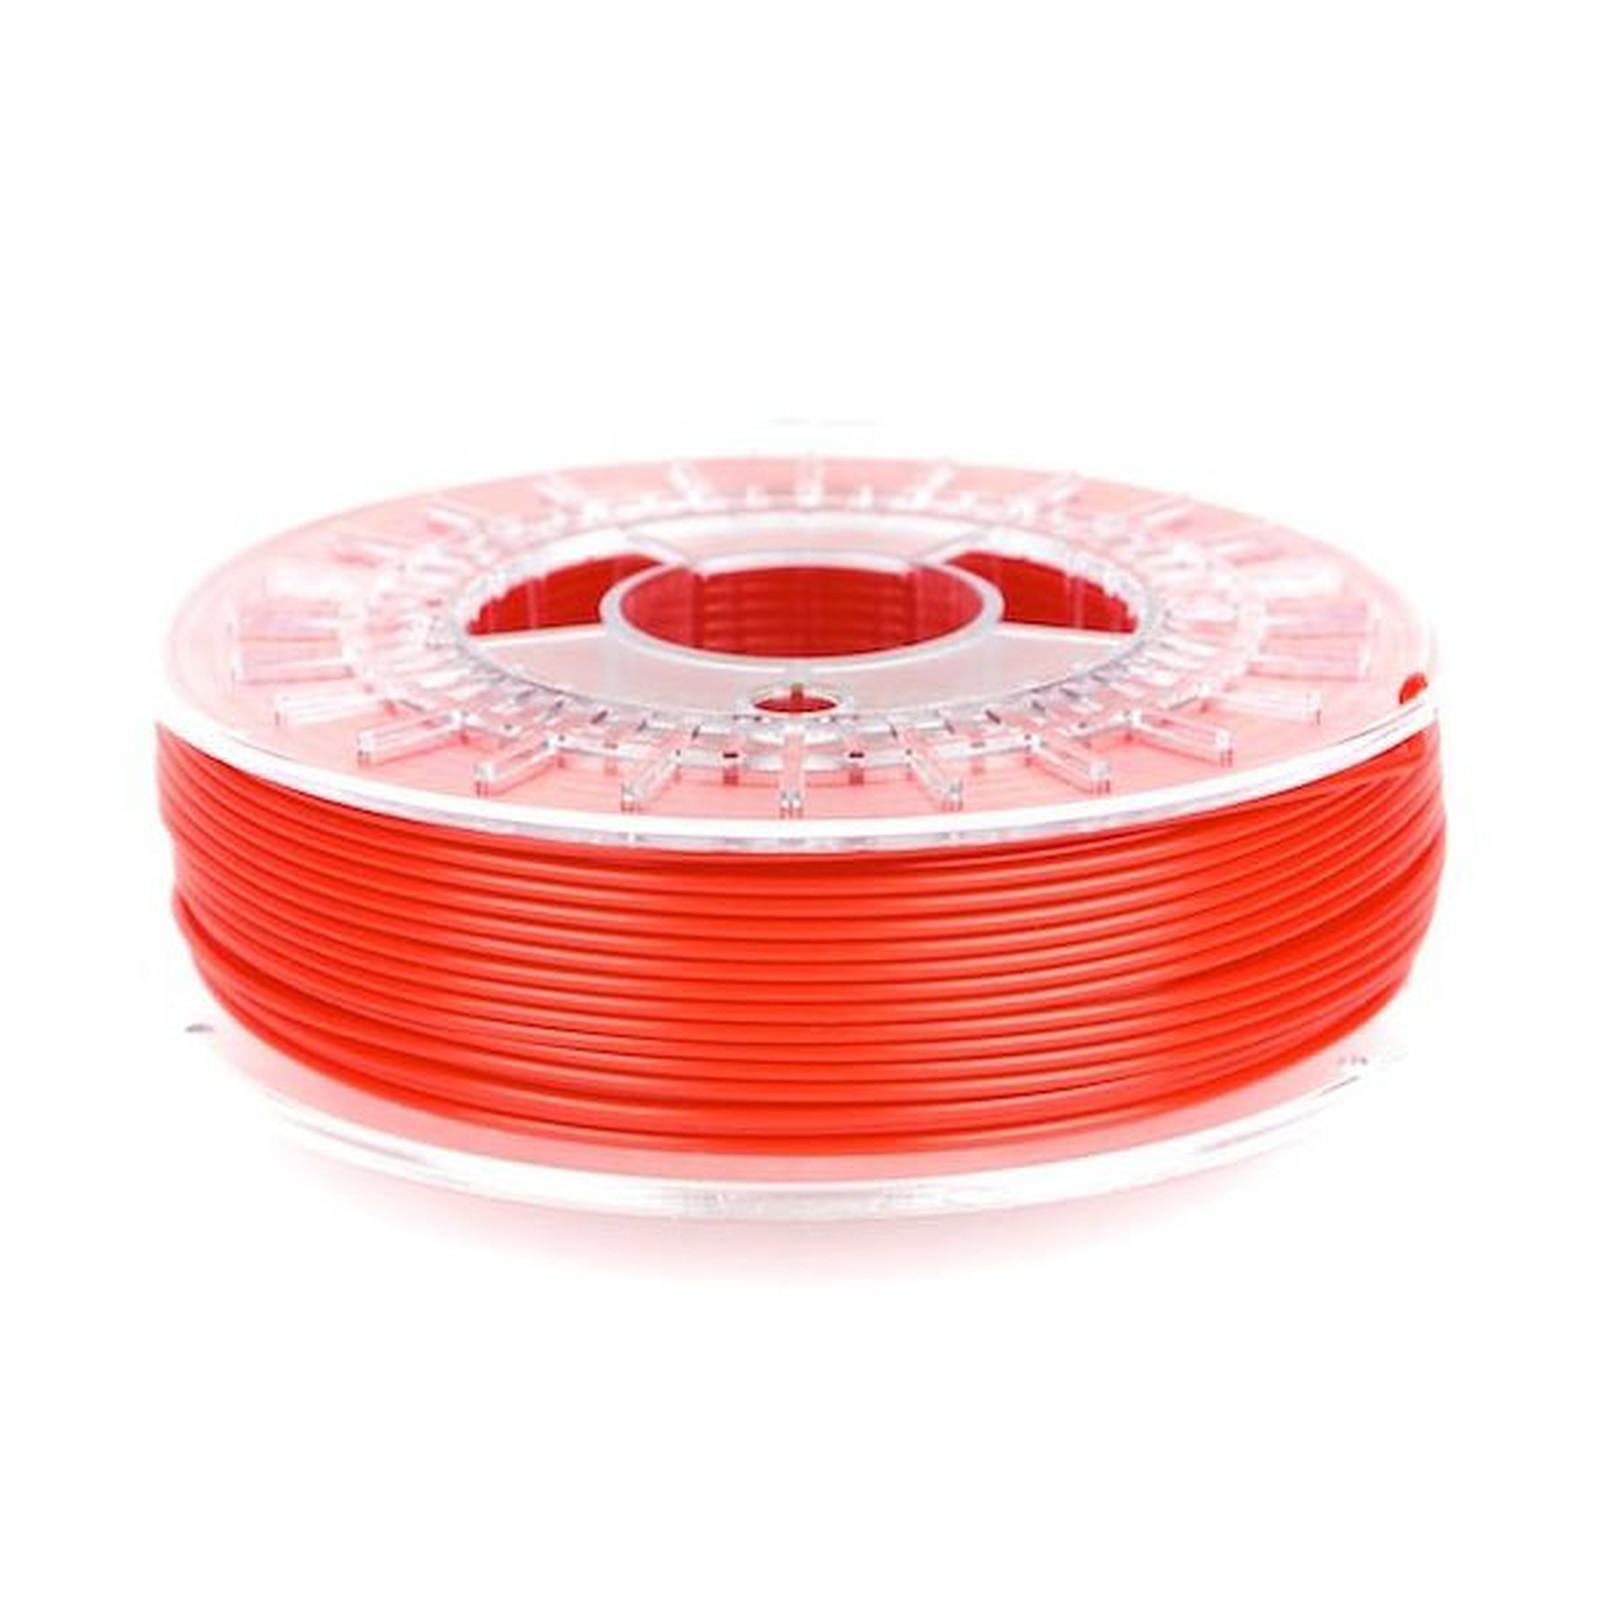 ColorFabb PLA 750g - Rouge traffic